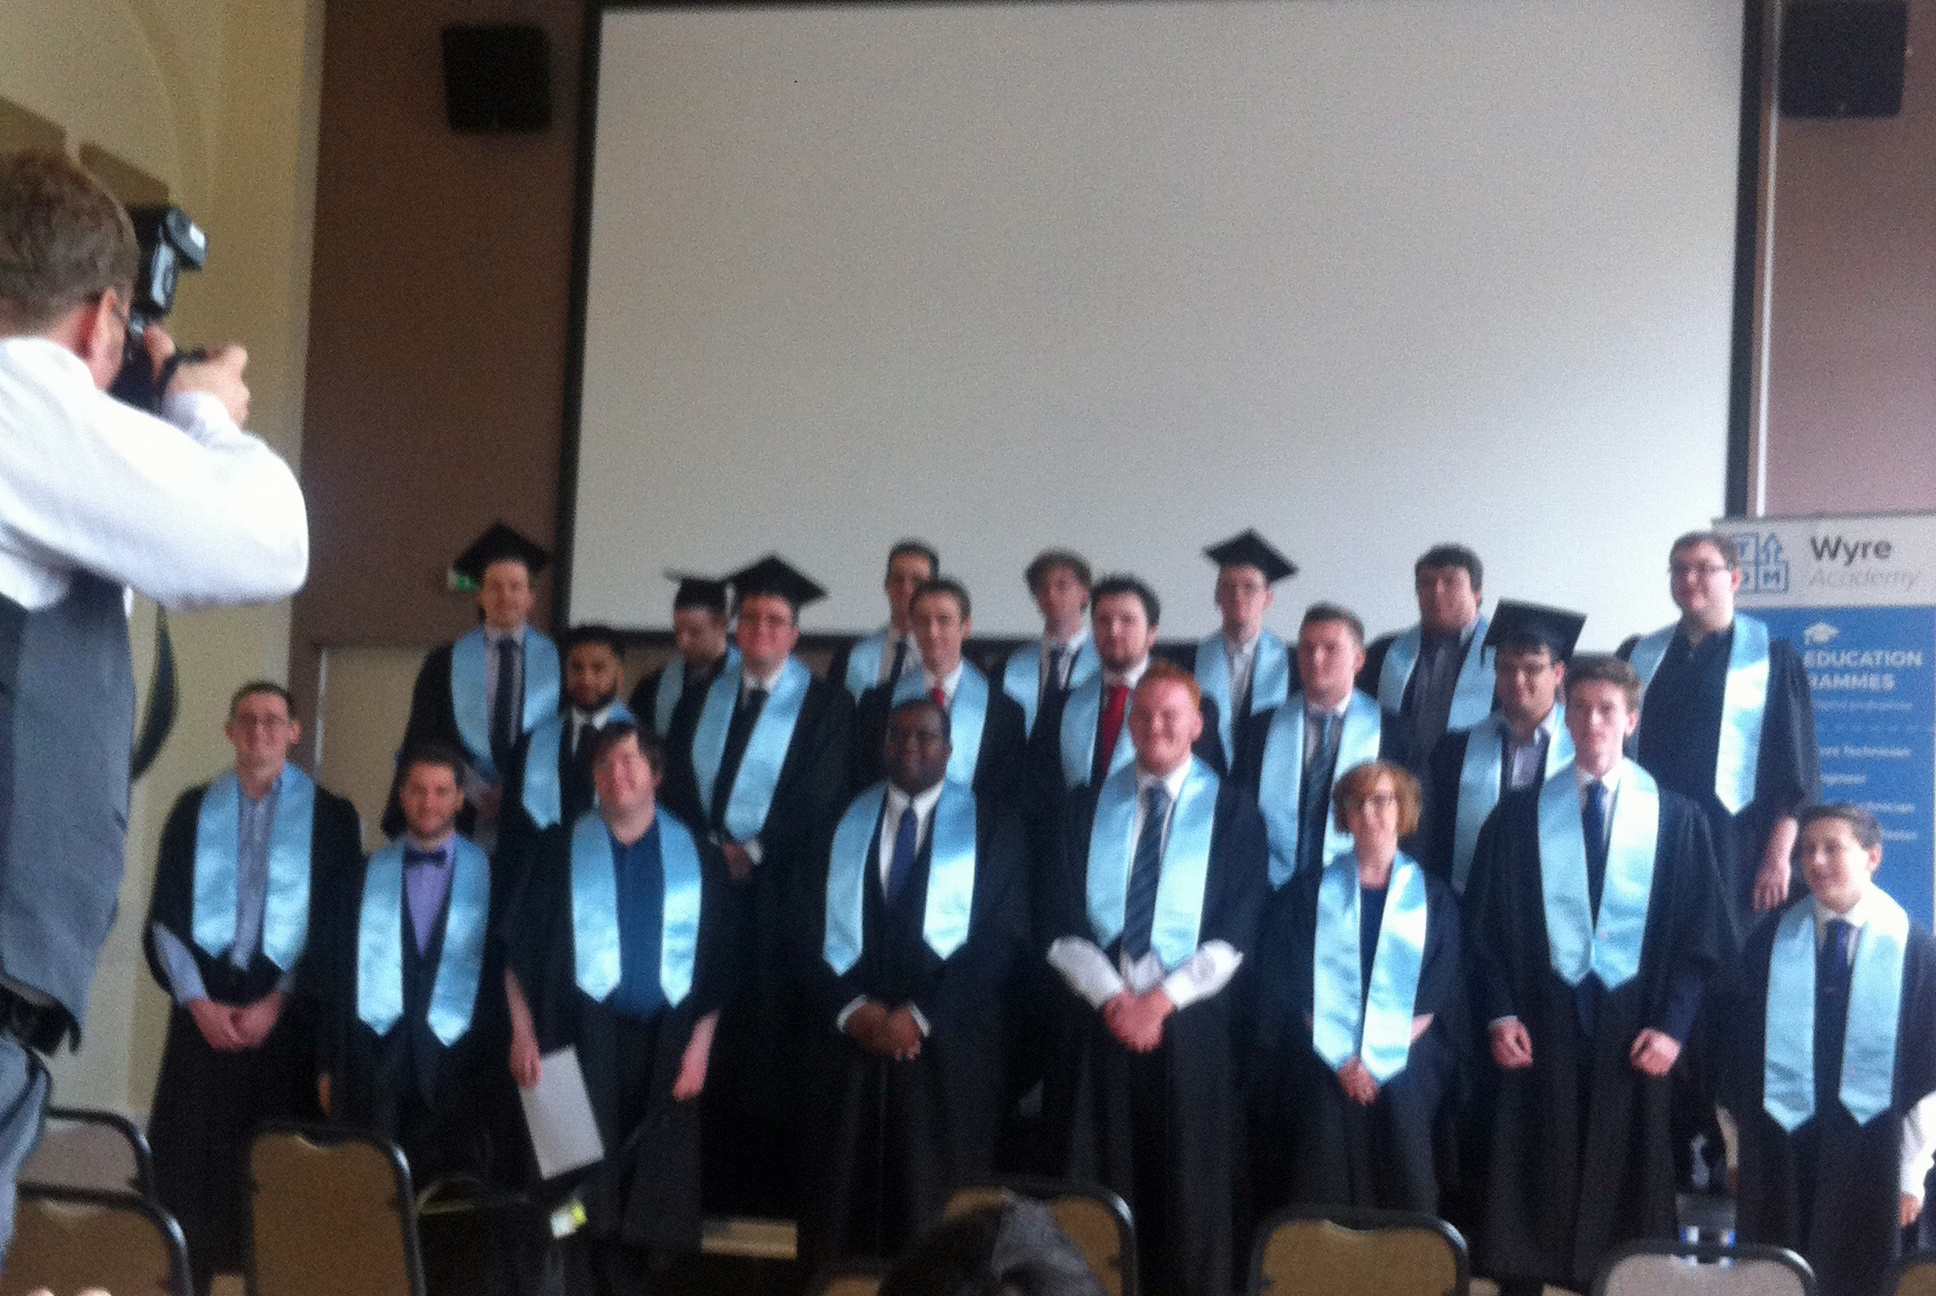 nFocus Celebrate Successful Graduation of Testing Apprentices